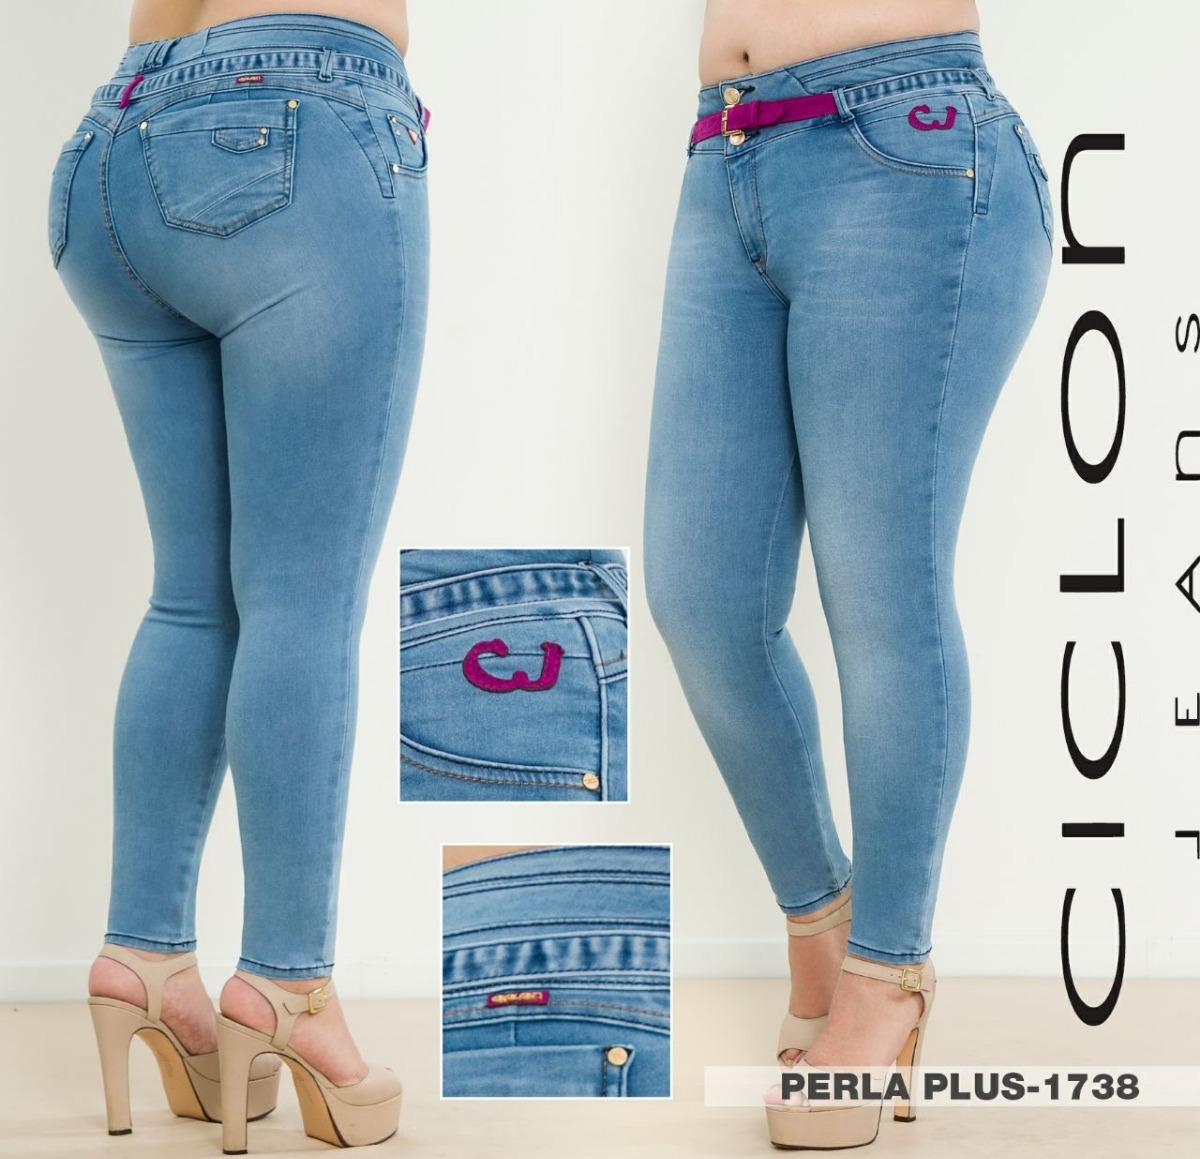 1bd43b3acb jeans ciclon pantalón mujer corte colombiano talla extra f. Cargando zoom.